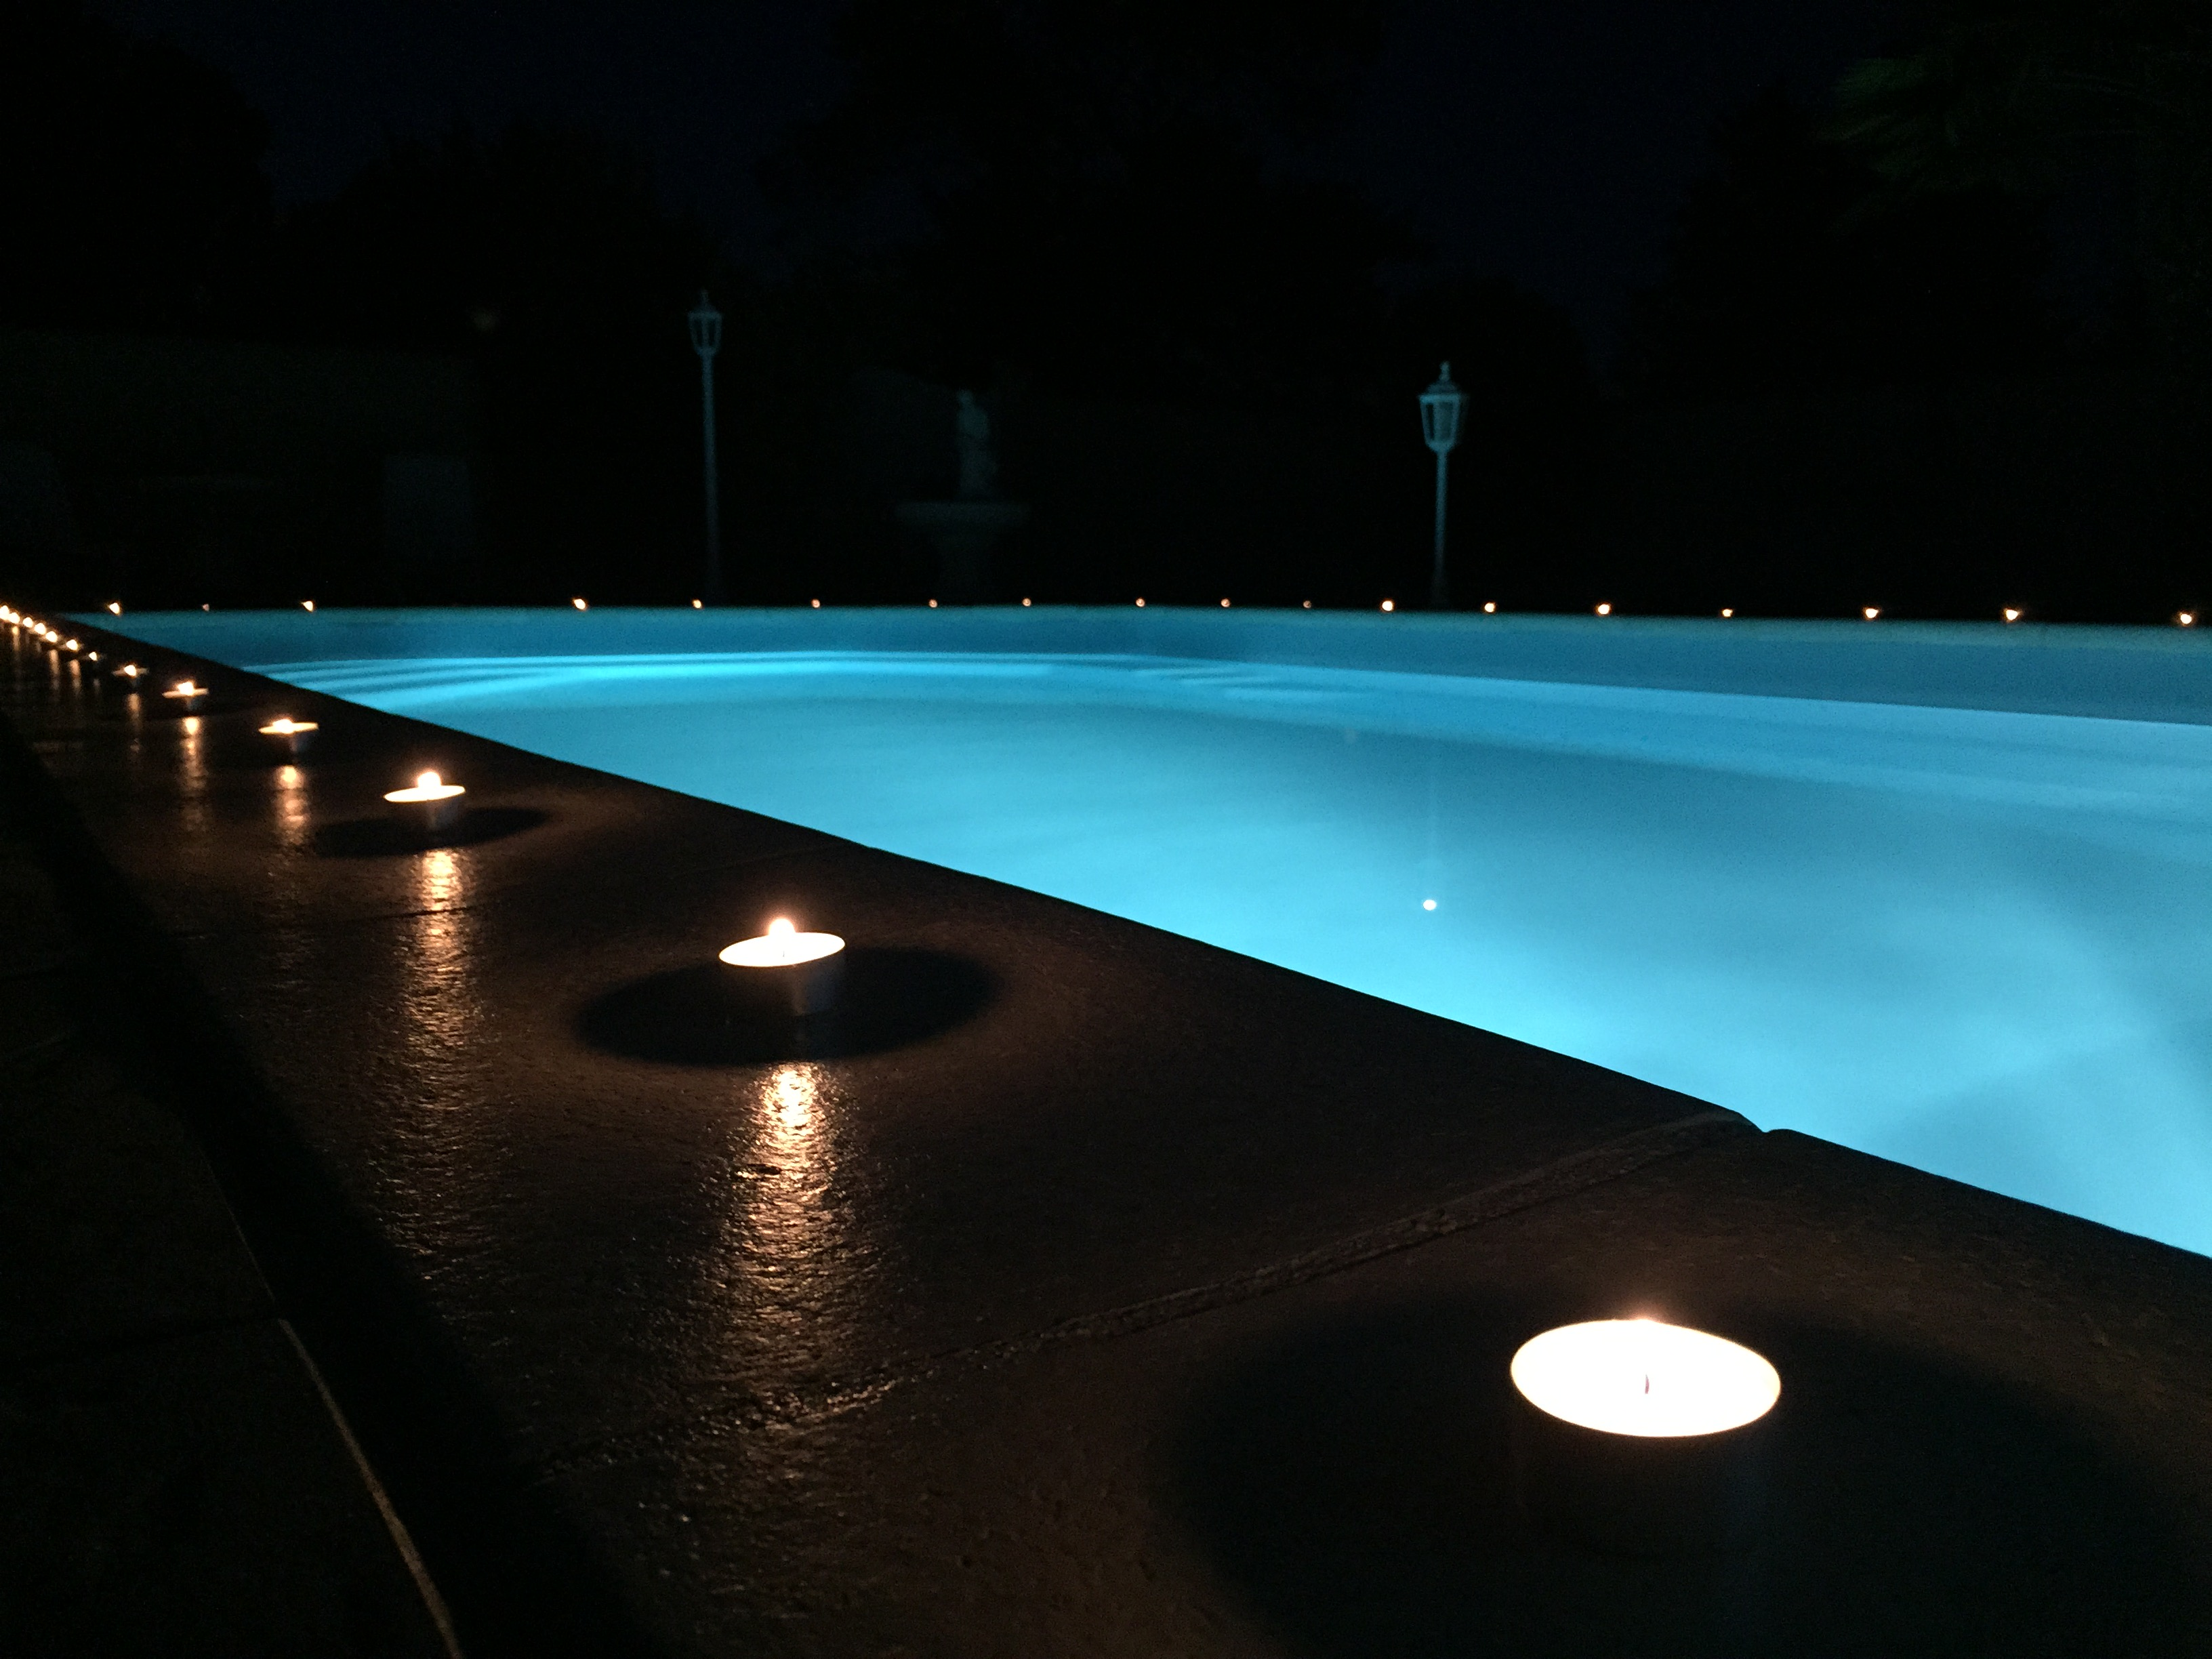 Gite piscine 6 personnes à Beaun.JPG